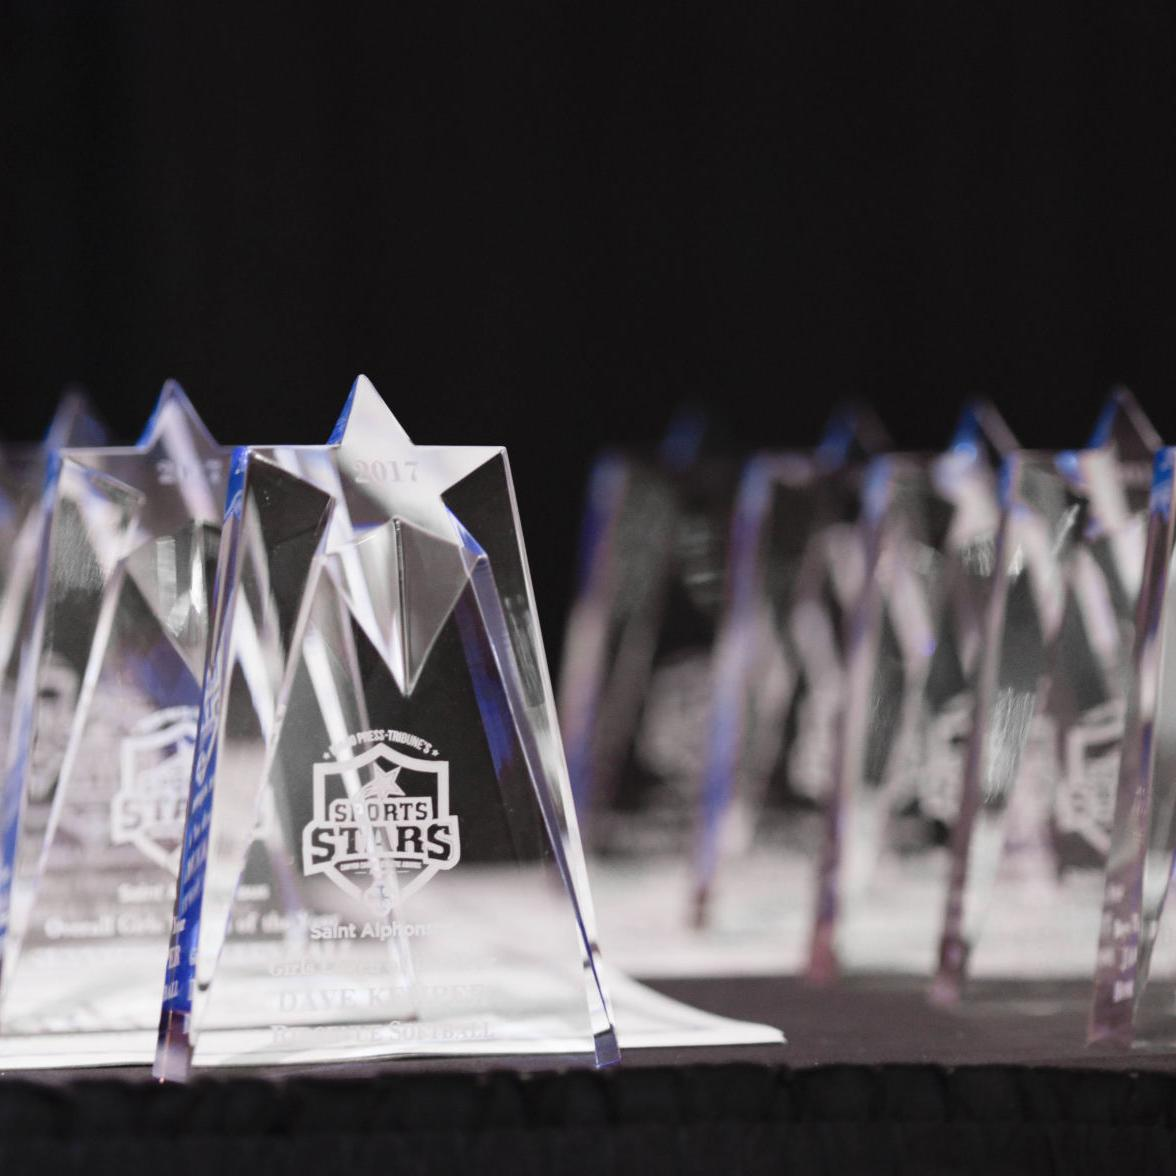 2017 Sports Stars Awards